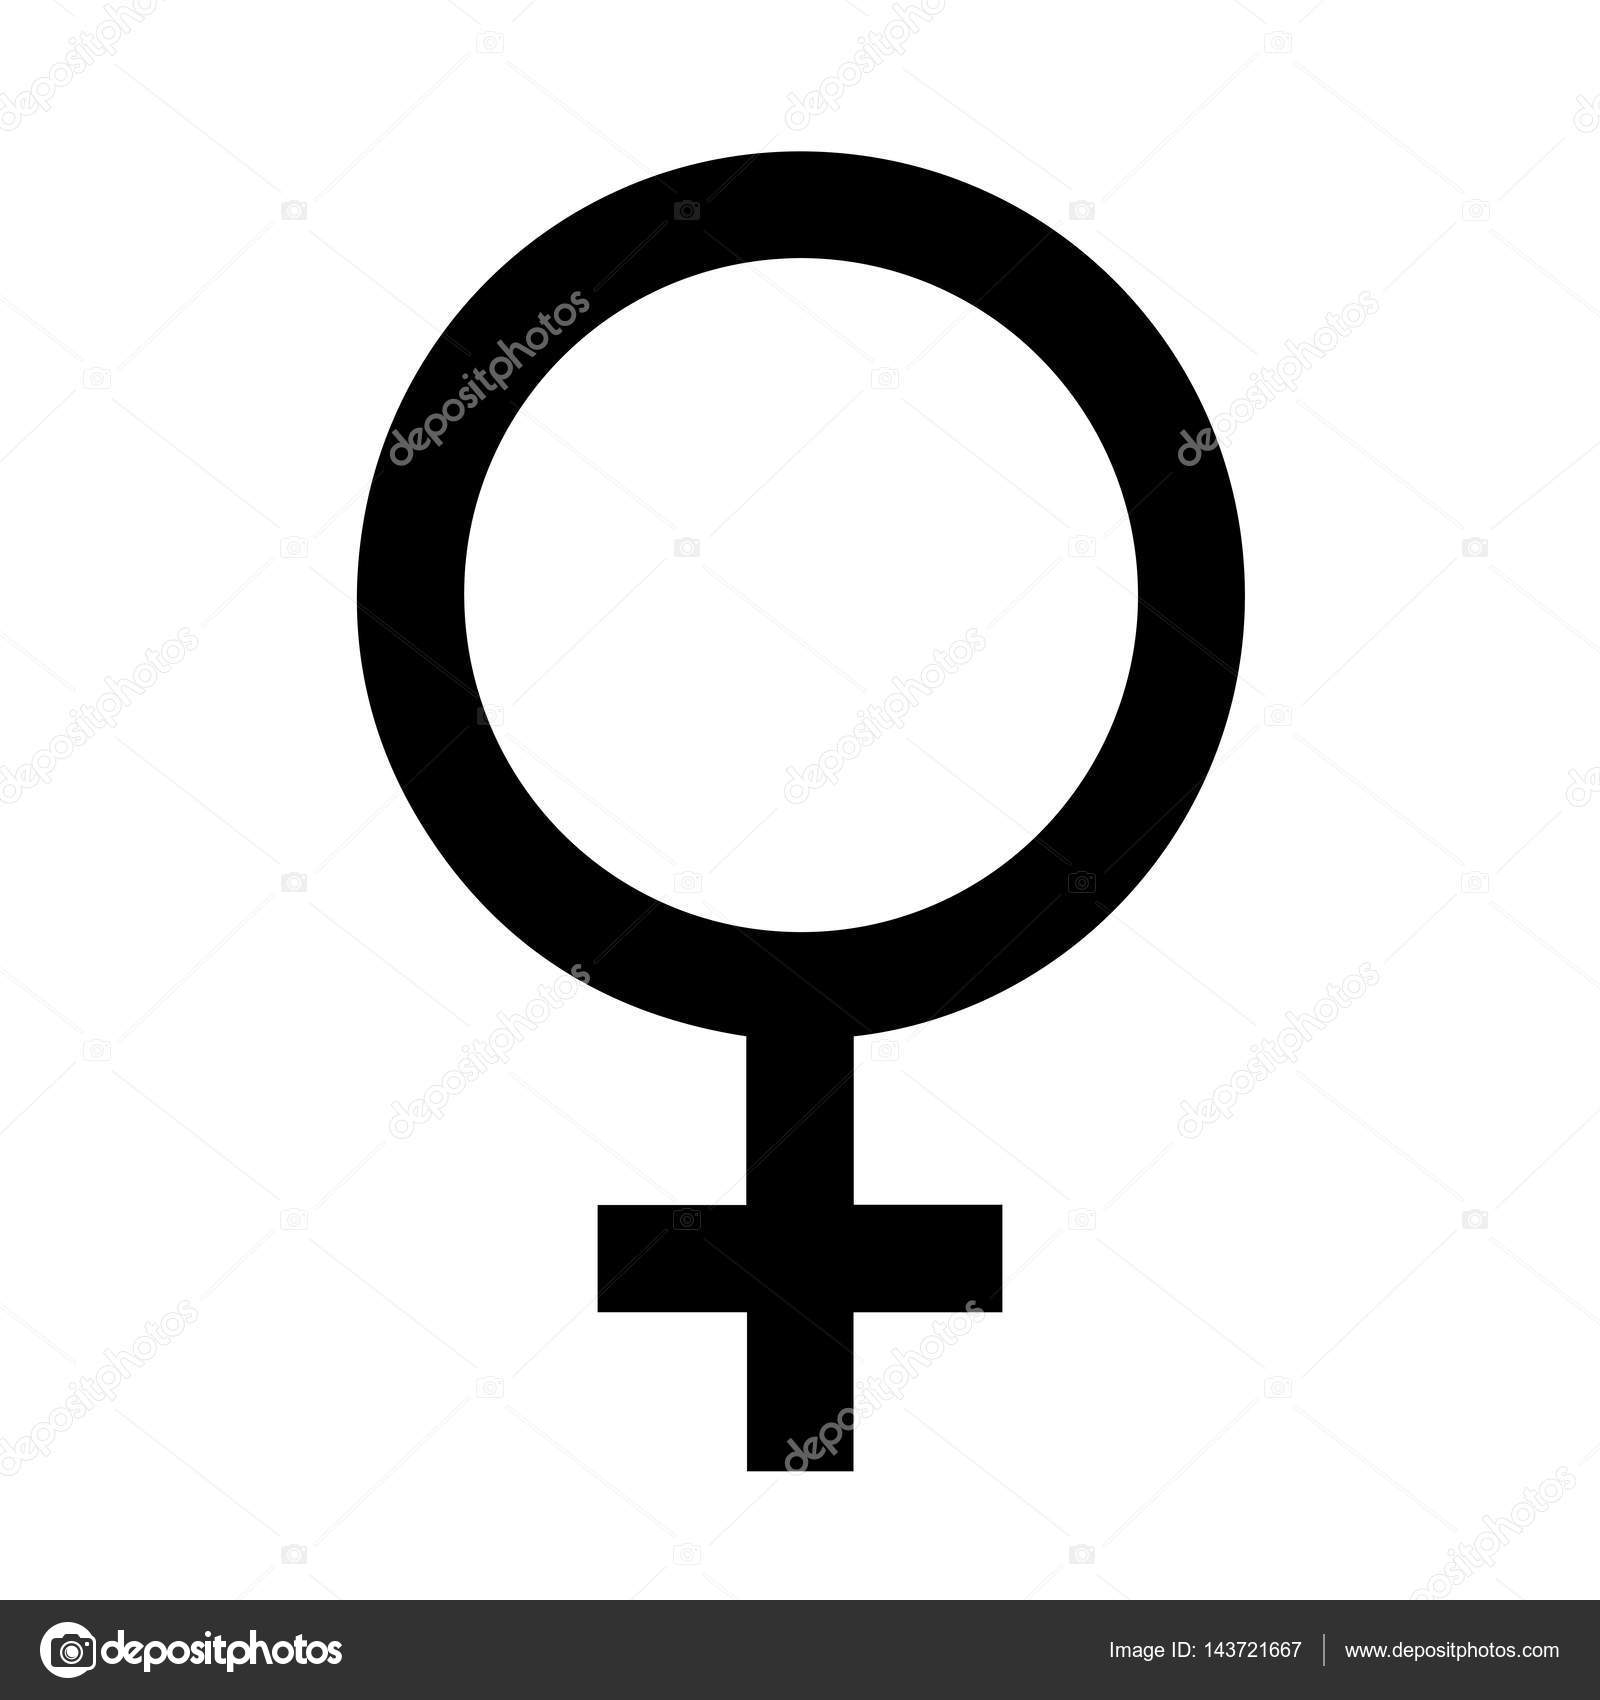 Gender symbol venus symbol the symbol for a female organism or gender symbol venus symbol the symbol for a female organism or woman stock biocorpaavc Choice Image